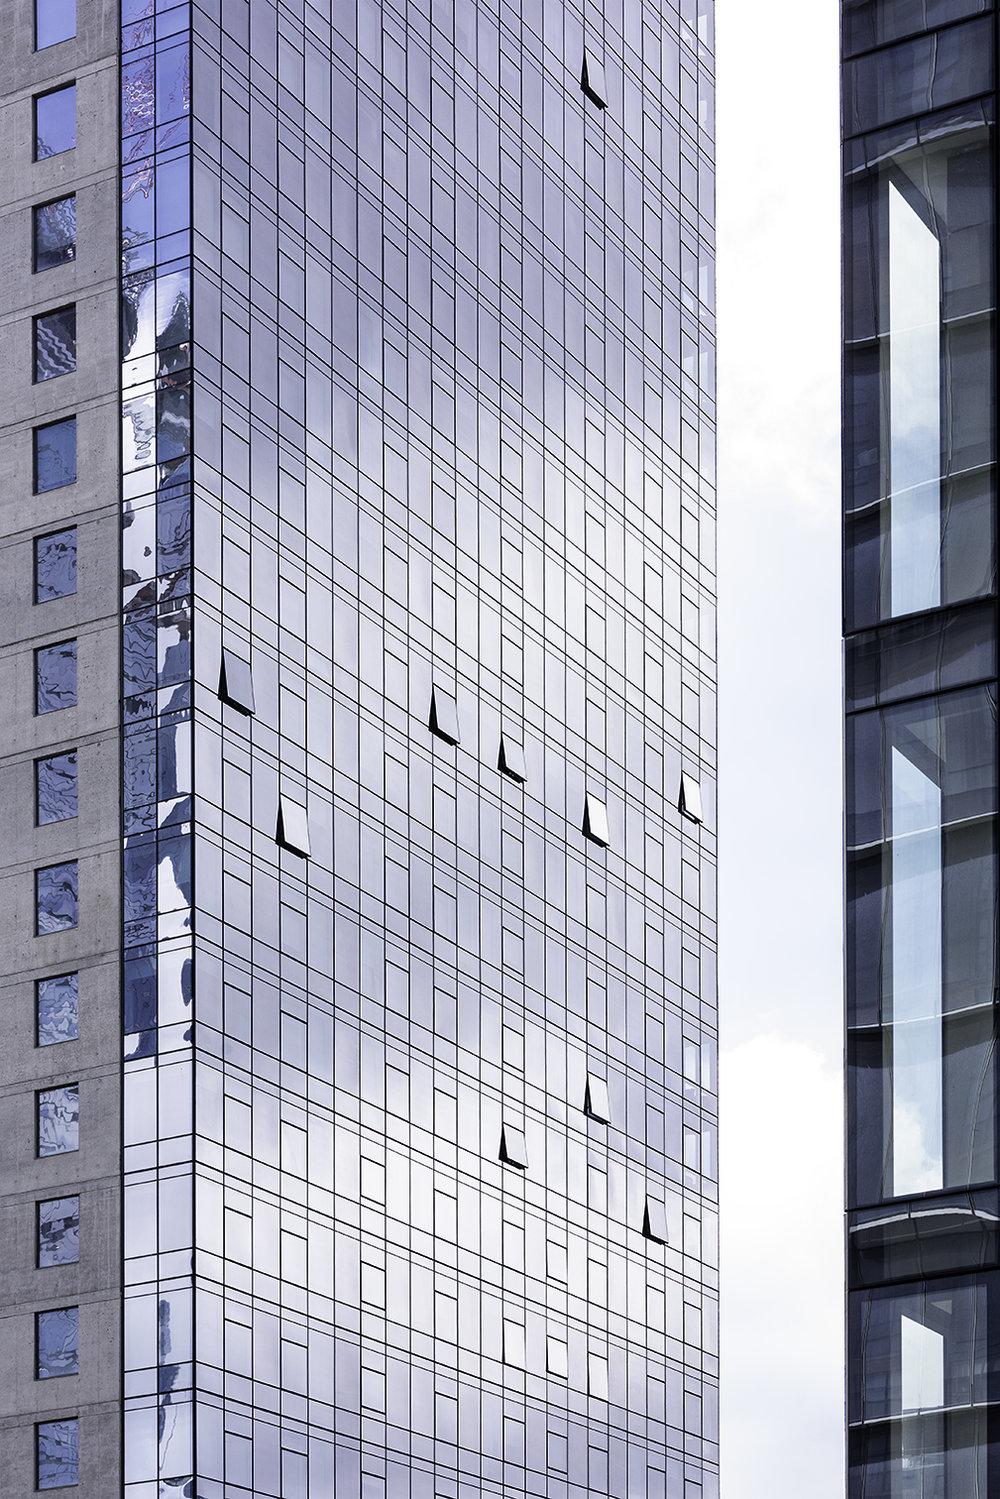 NYC Architecture_WEBSITE_0206.jpg